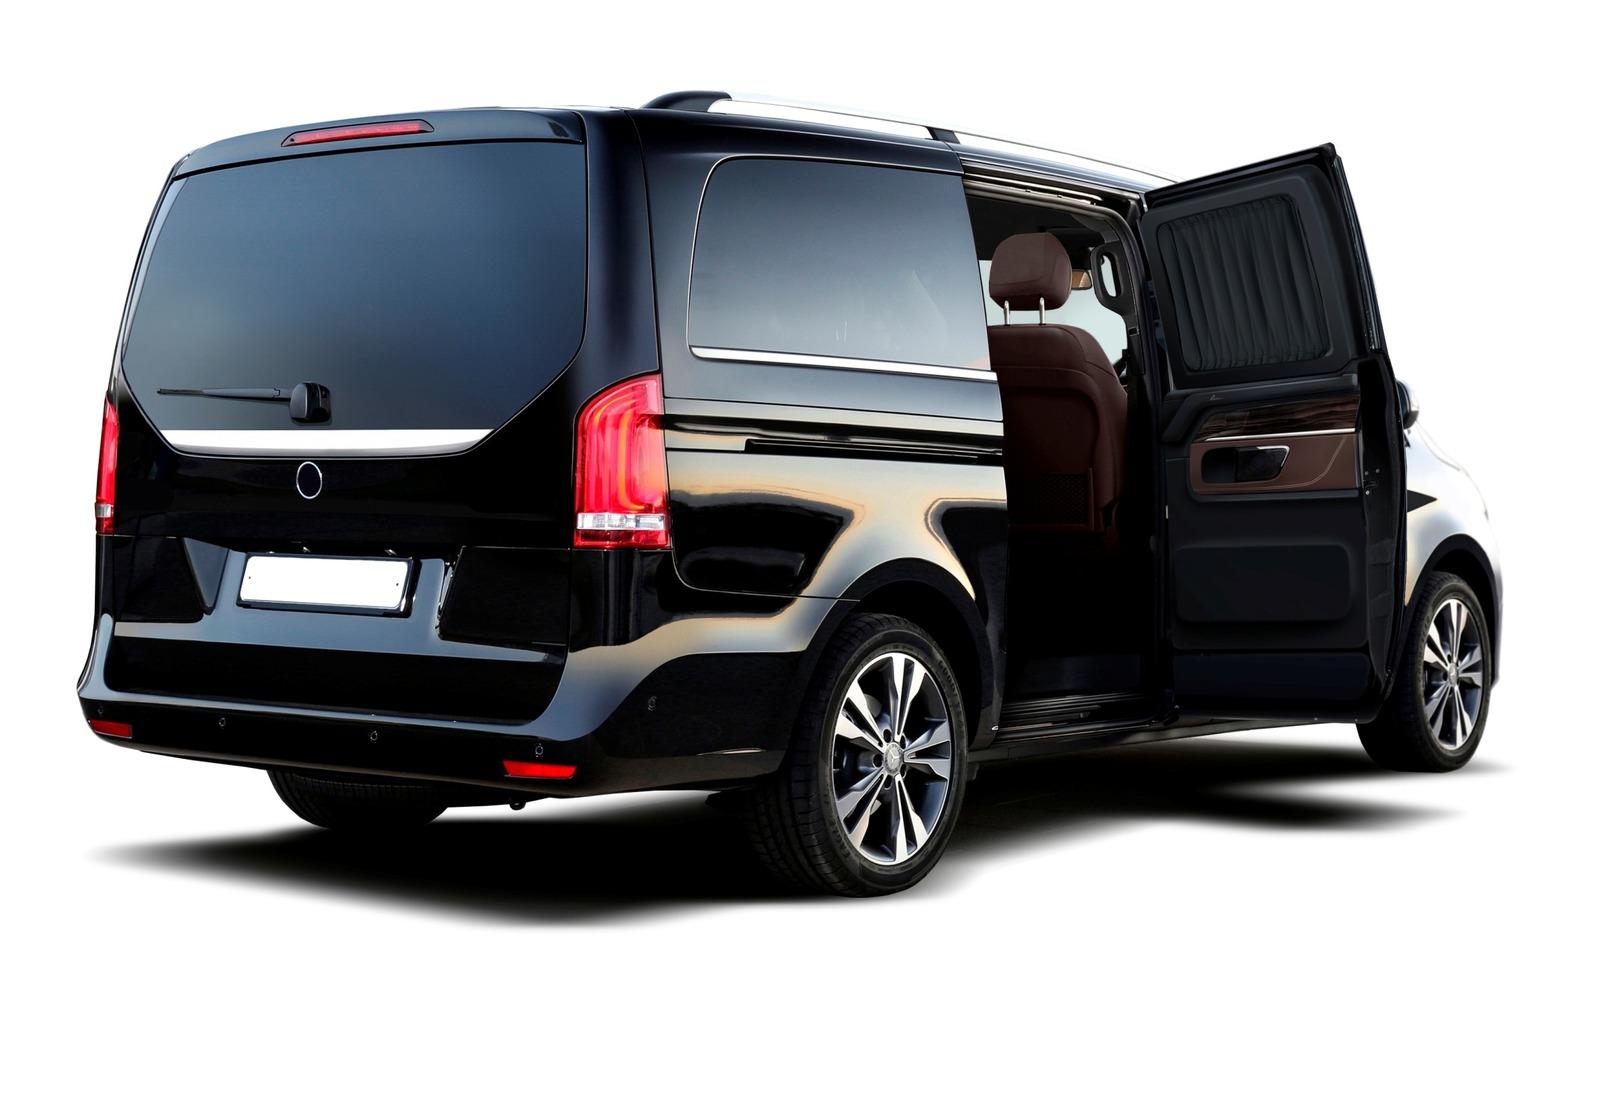 Mercedes-Benz V-Class V 300 | VIP Armored Cars, Armored Vans